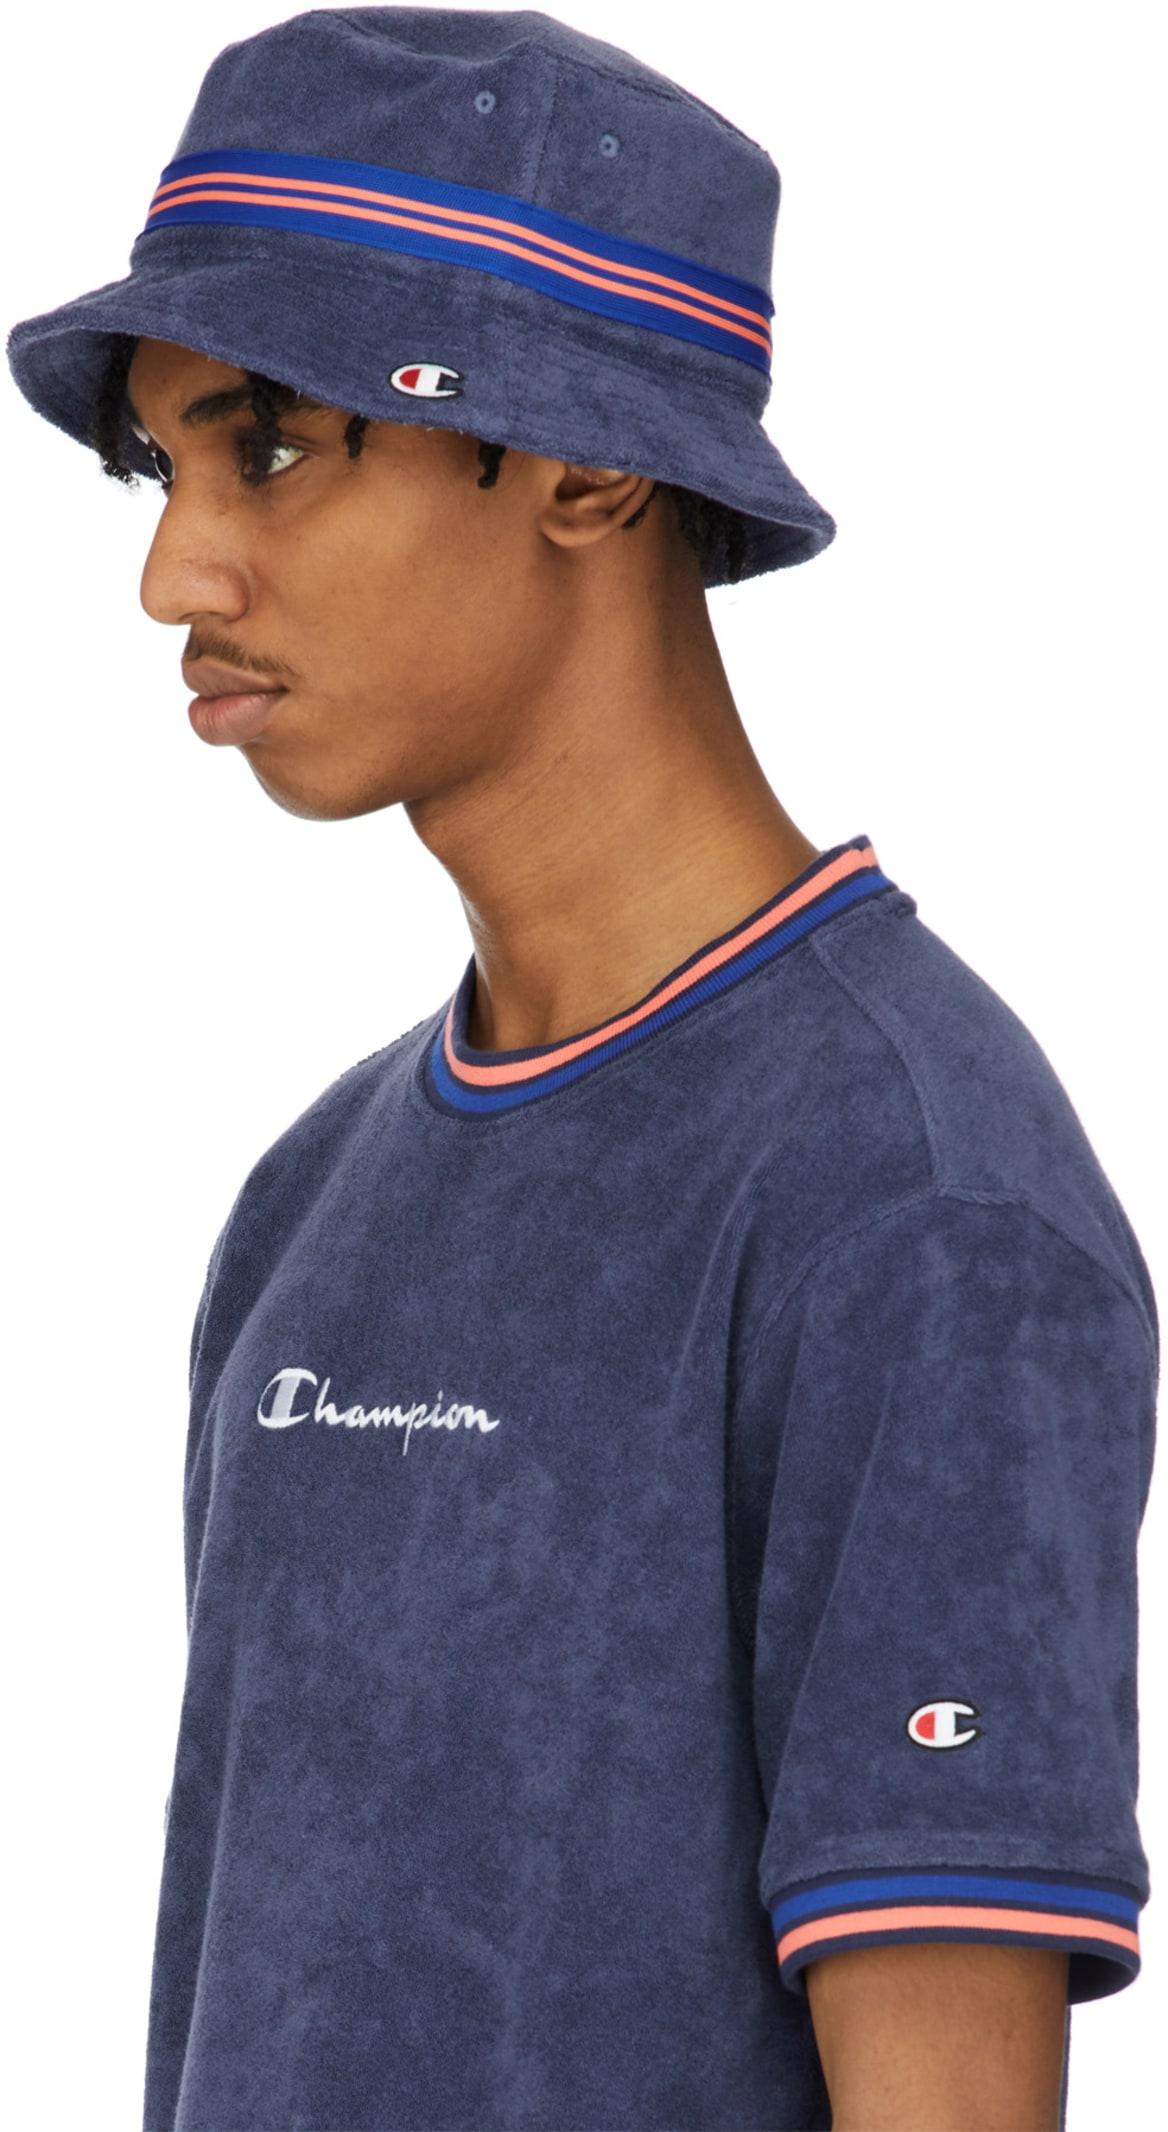 245bf09aeda71f Champion: Terry Cloth Bucket Hat - Imperial Indigo | influenceu